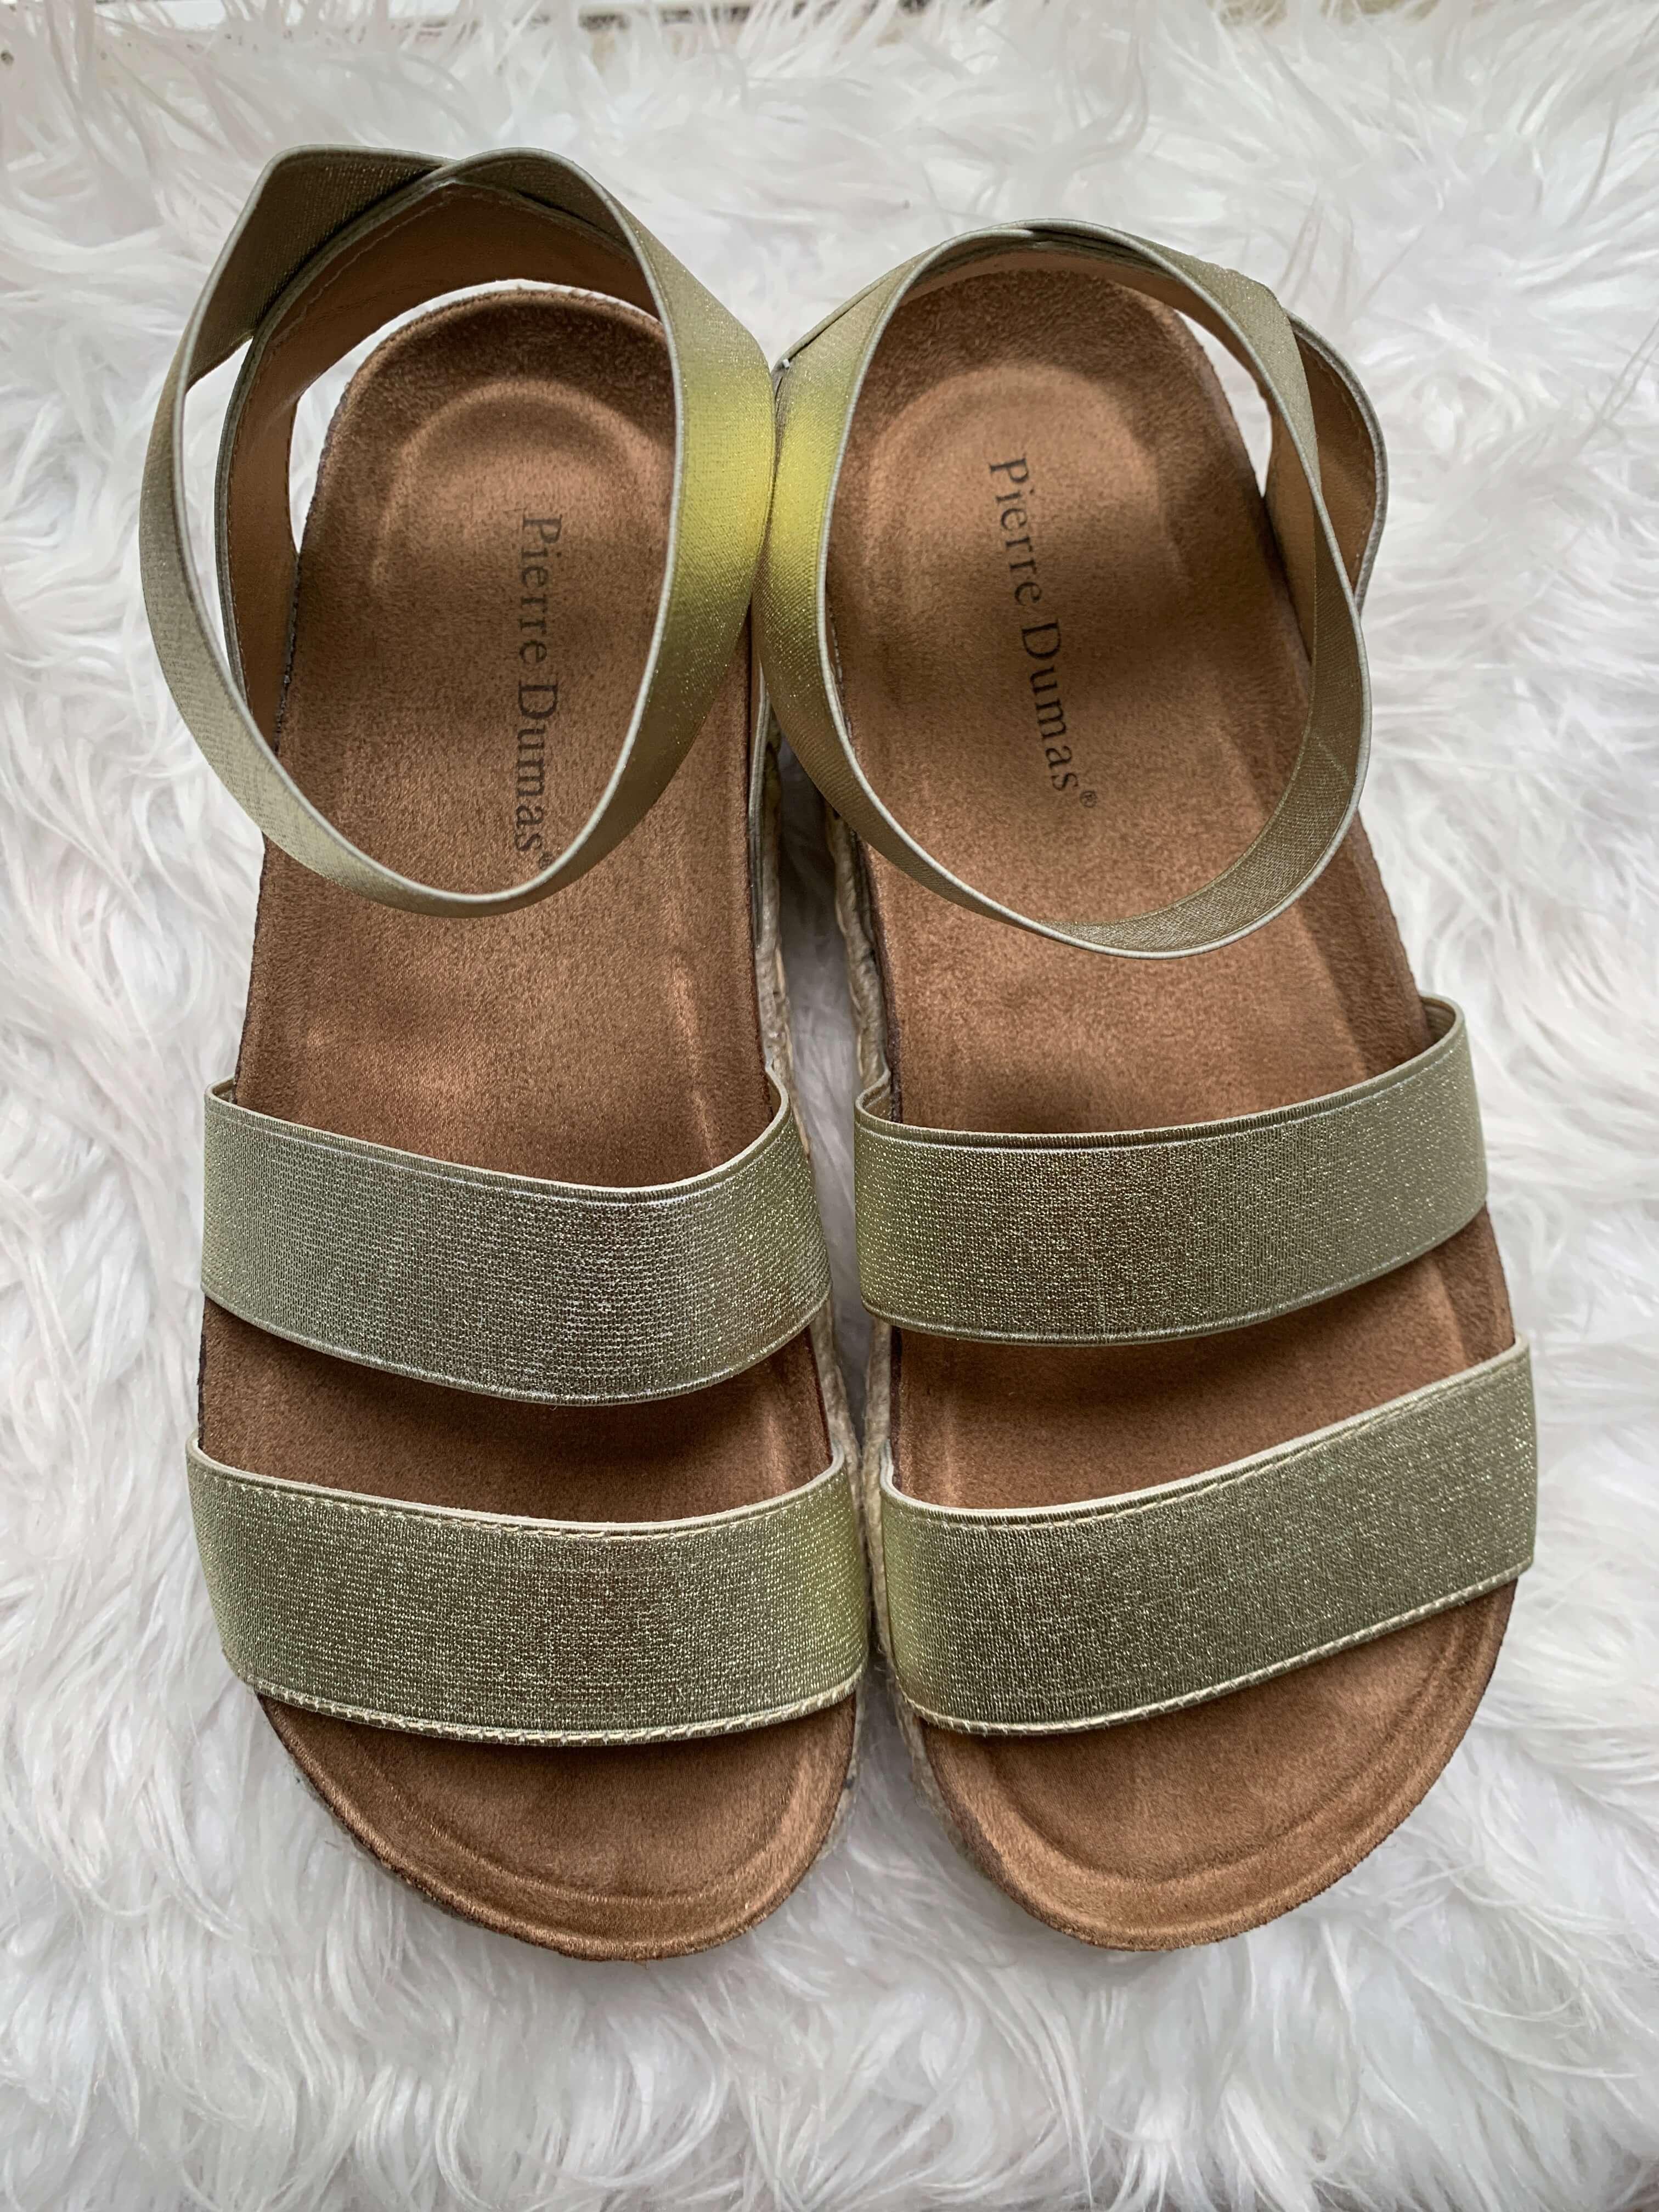 Amazon Fashion Haul | gold espadrille flatform | Style Your Senses